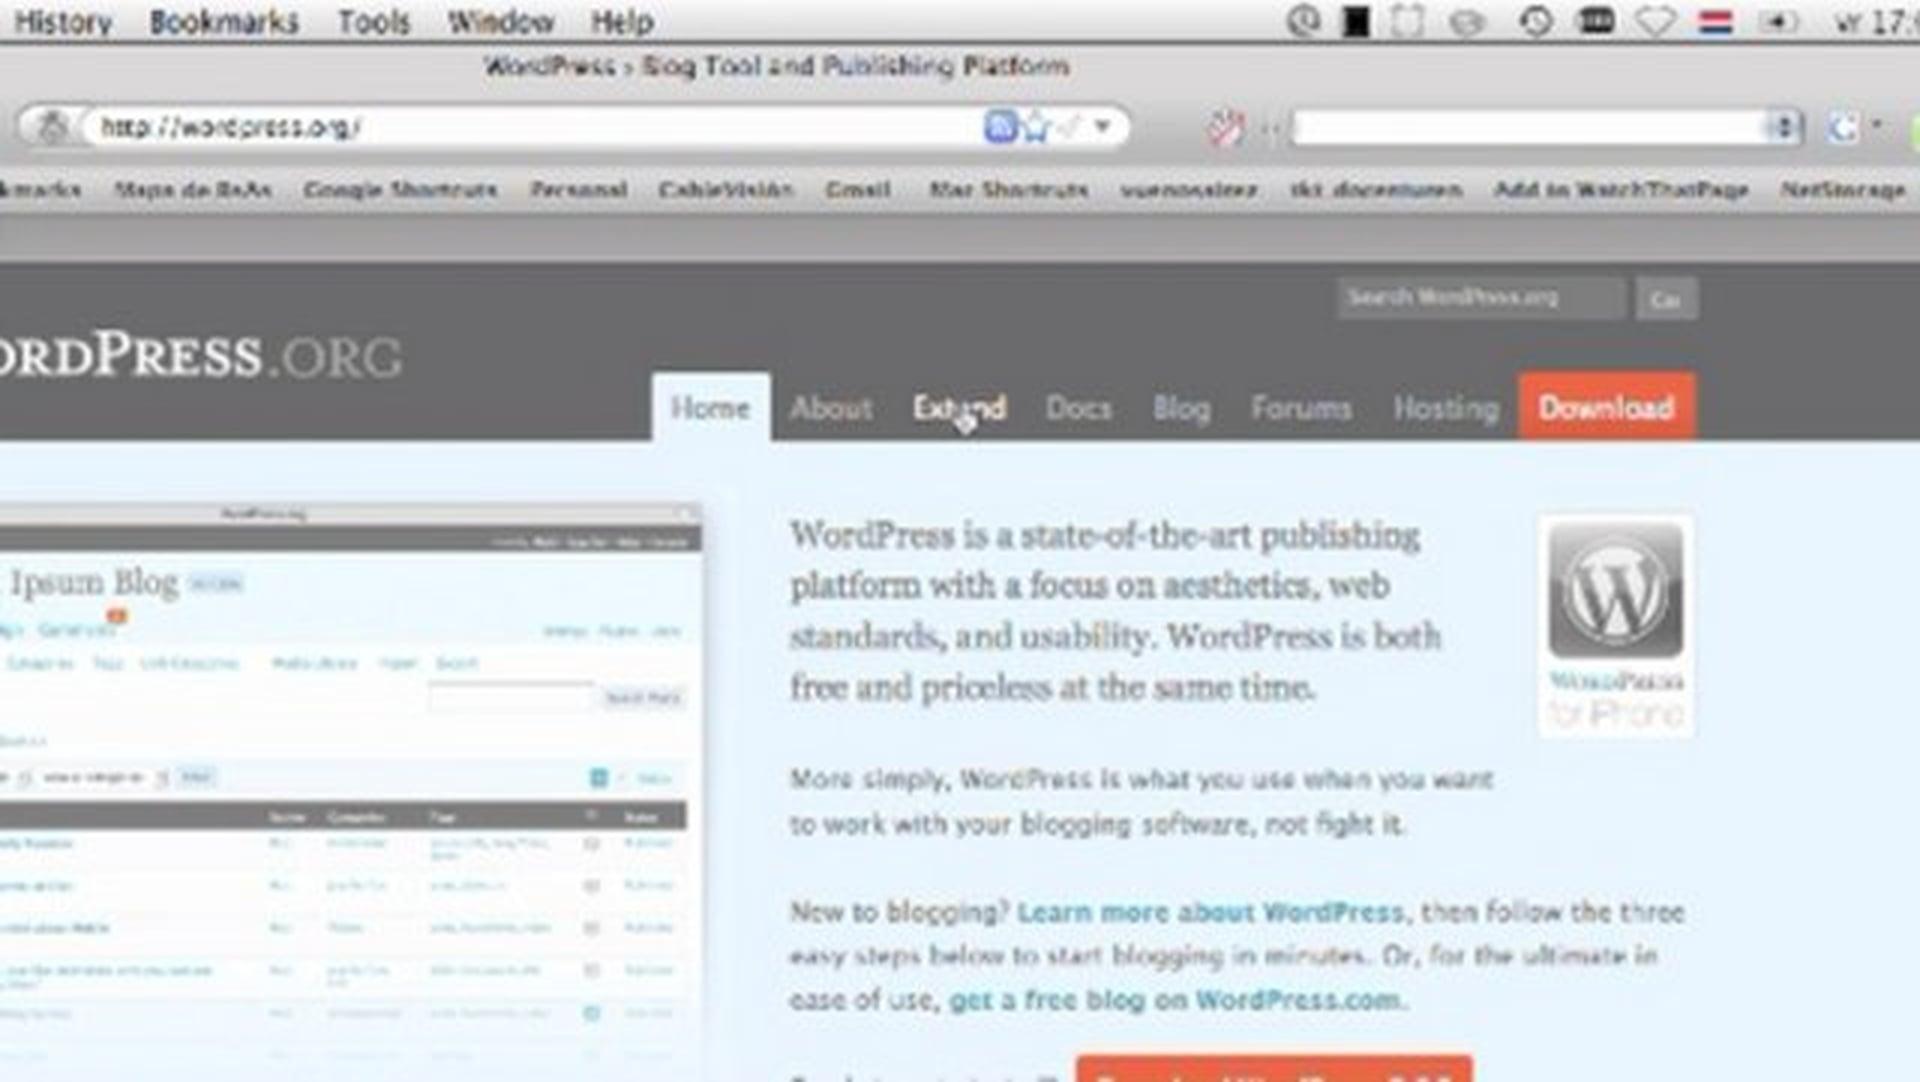 WordPress installation and theme tutorial